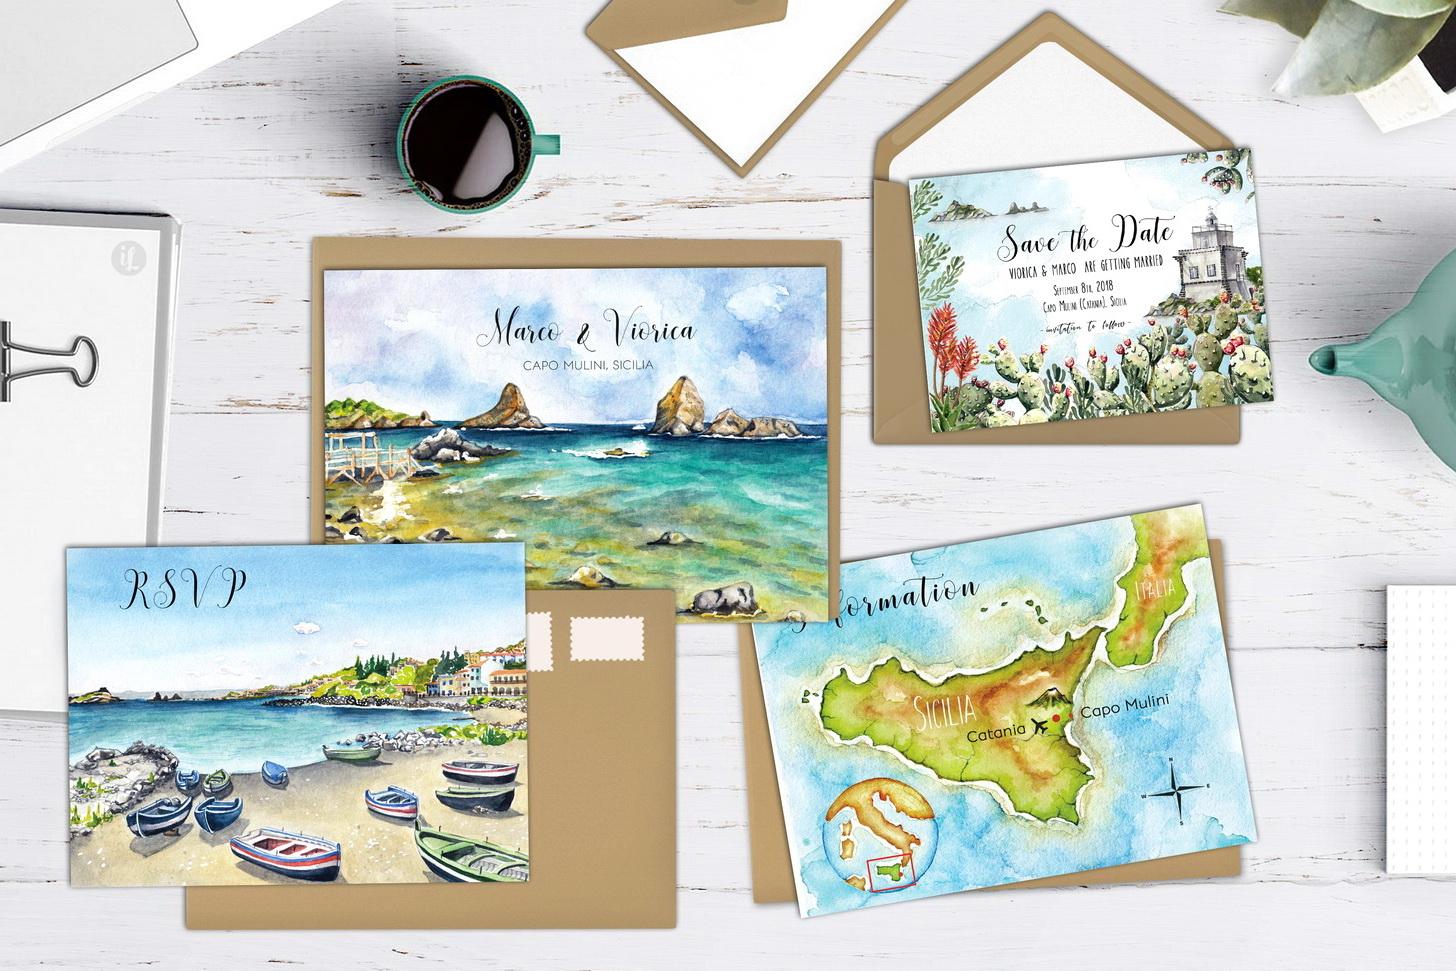 Sicilian-illustrated-wedding-suite_by-Irina-Luchian 5.jpg